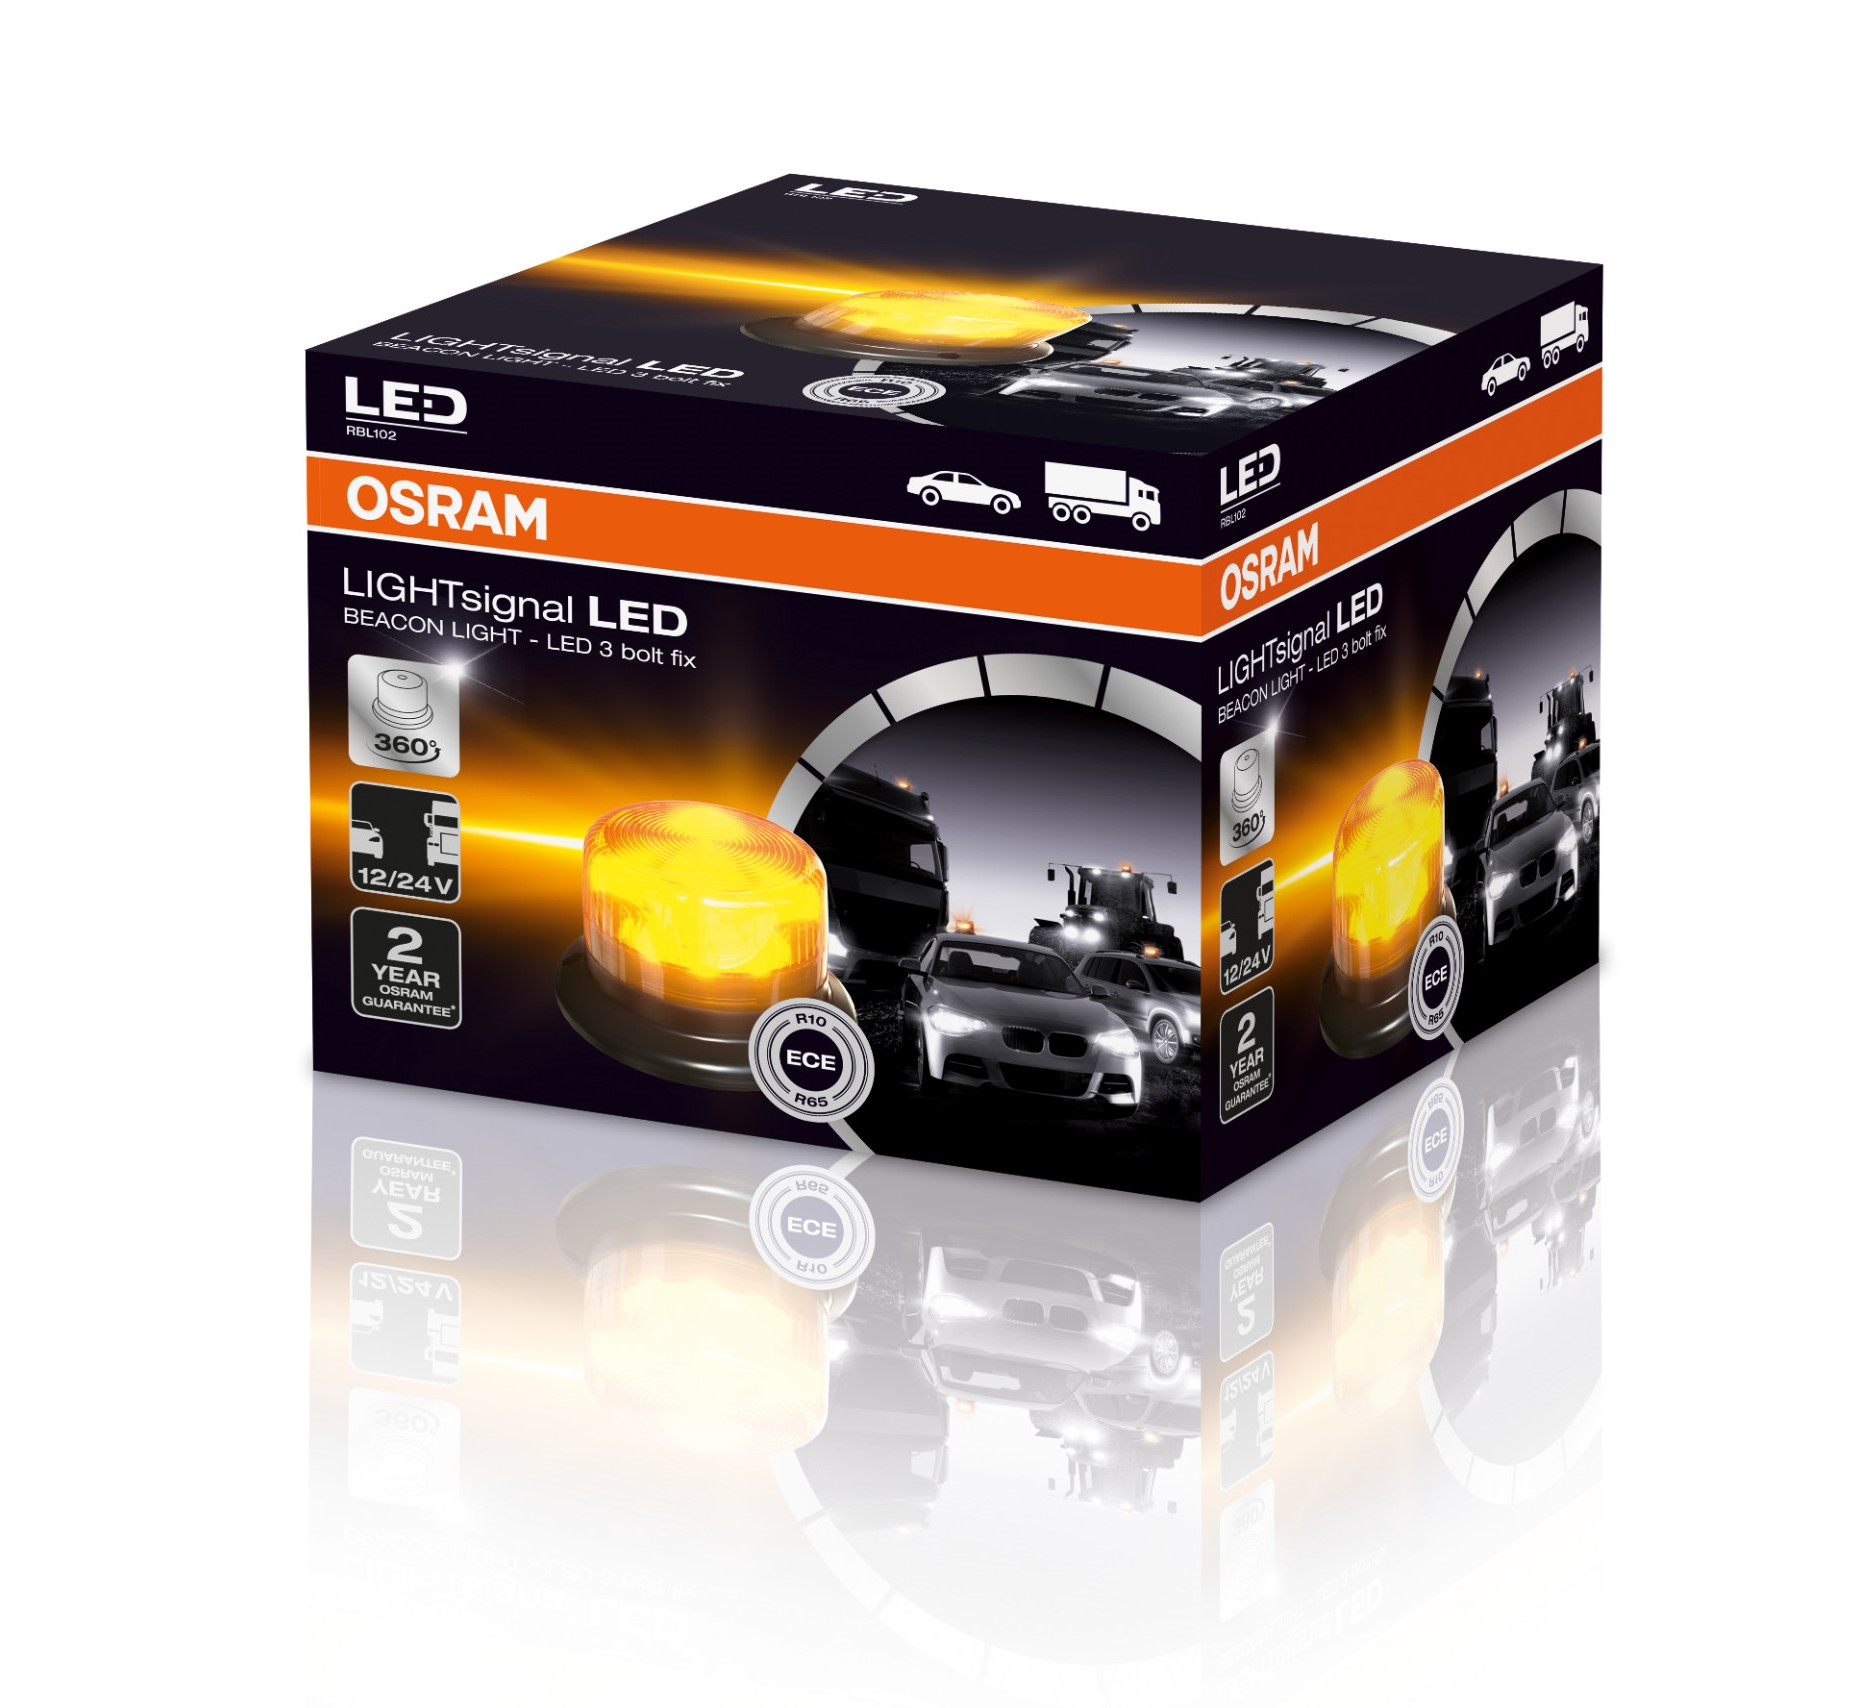 LIGHTsignal LED BEACON LIGHT 360° ...